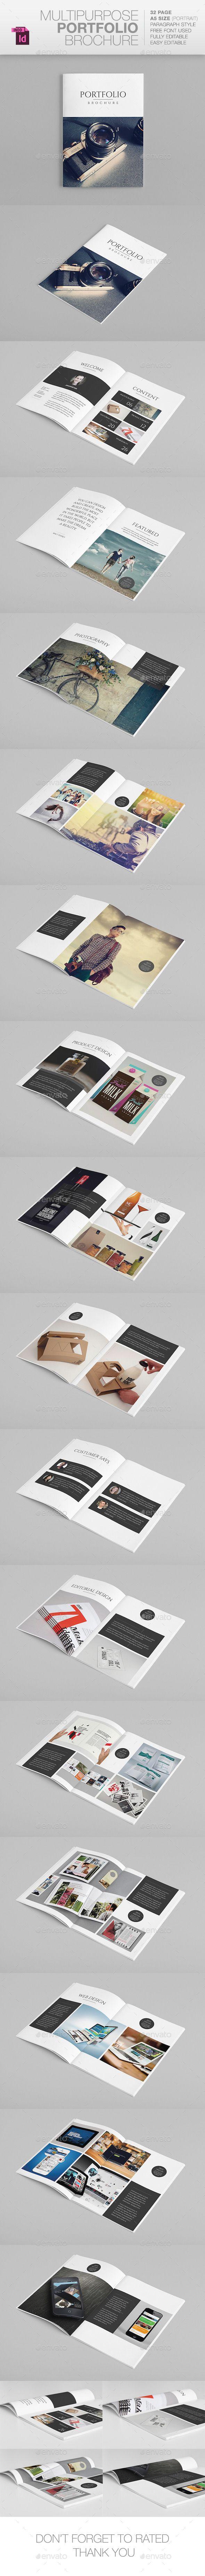 Multipurpose A5 Portfolio | Indesign templates, A5 and Template